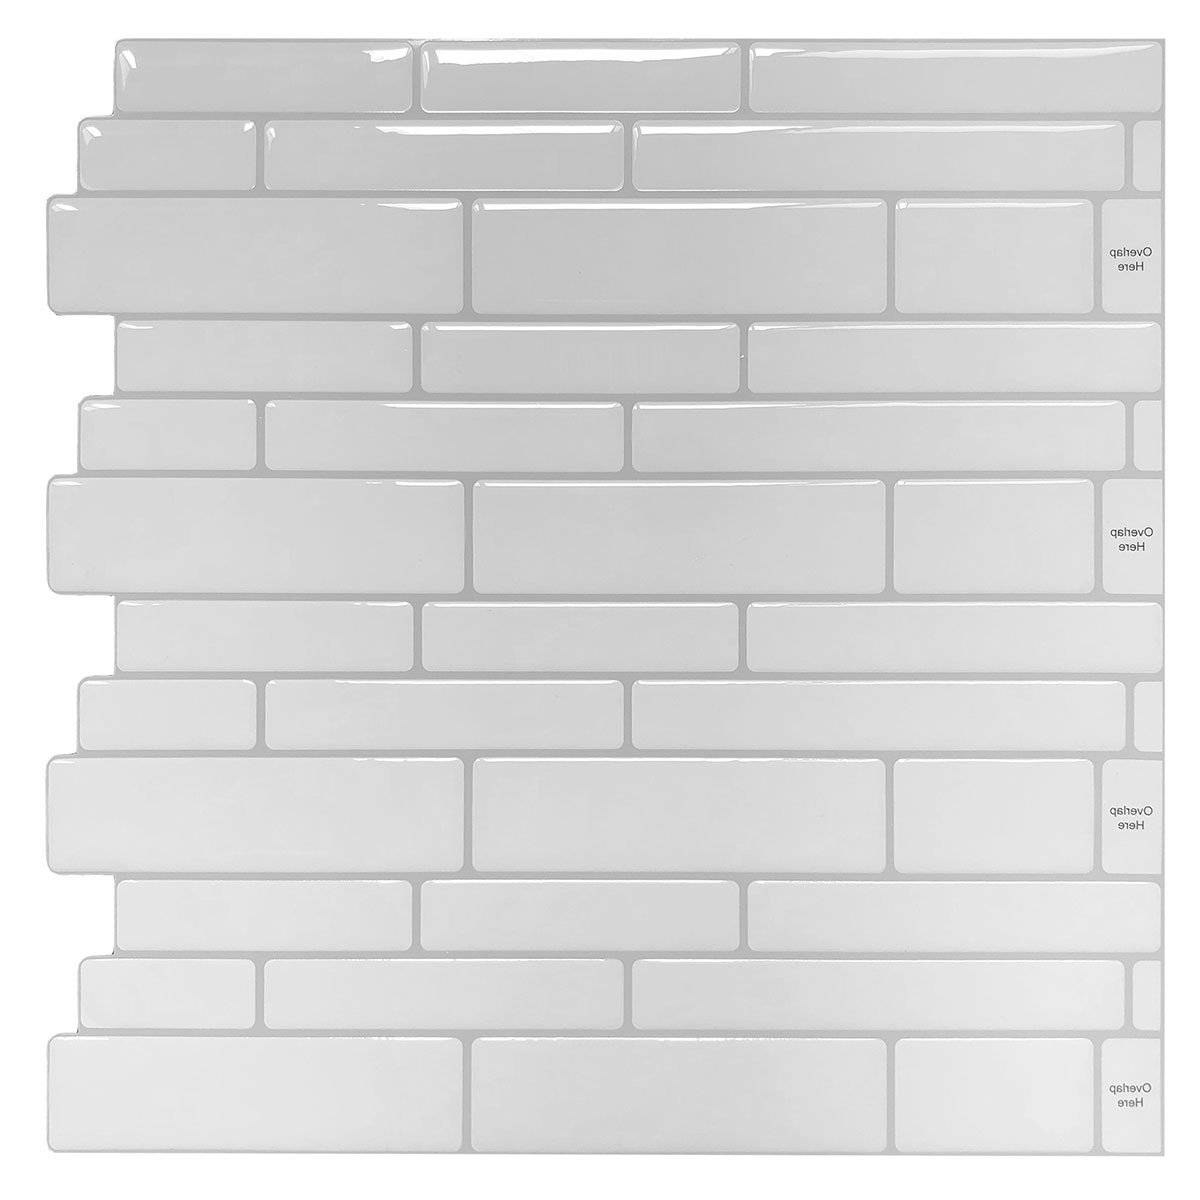 - 10 Sheets Peel And Stick Backsplash Tile Shelf-adhesive Wall Stickers -  Walmart.com - Walmart.com